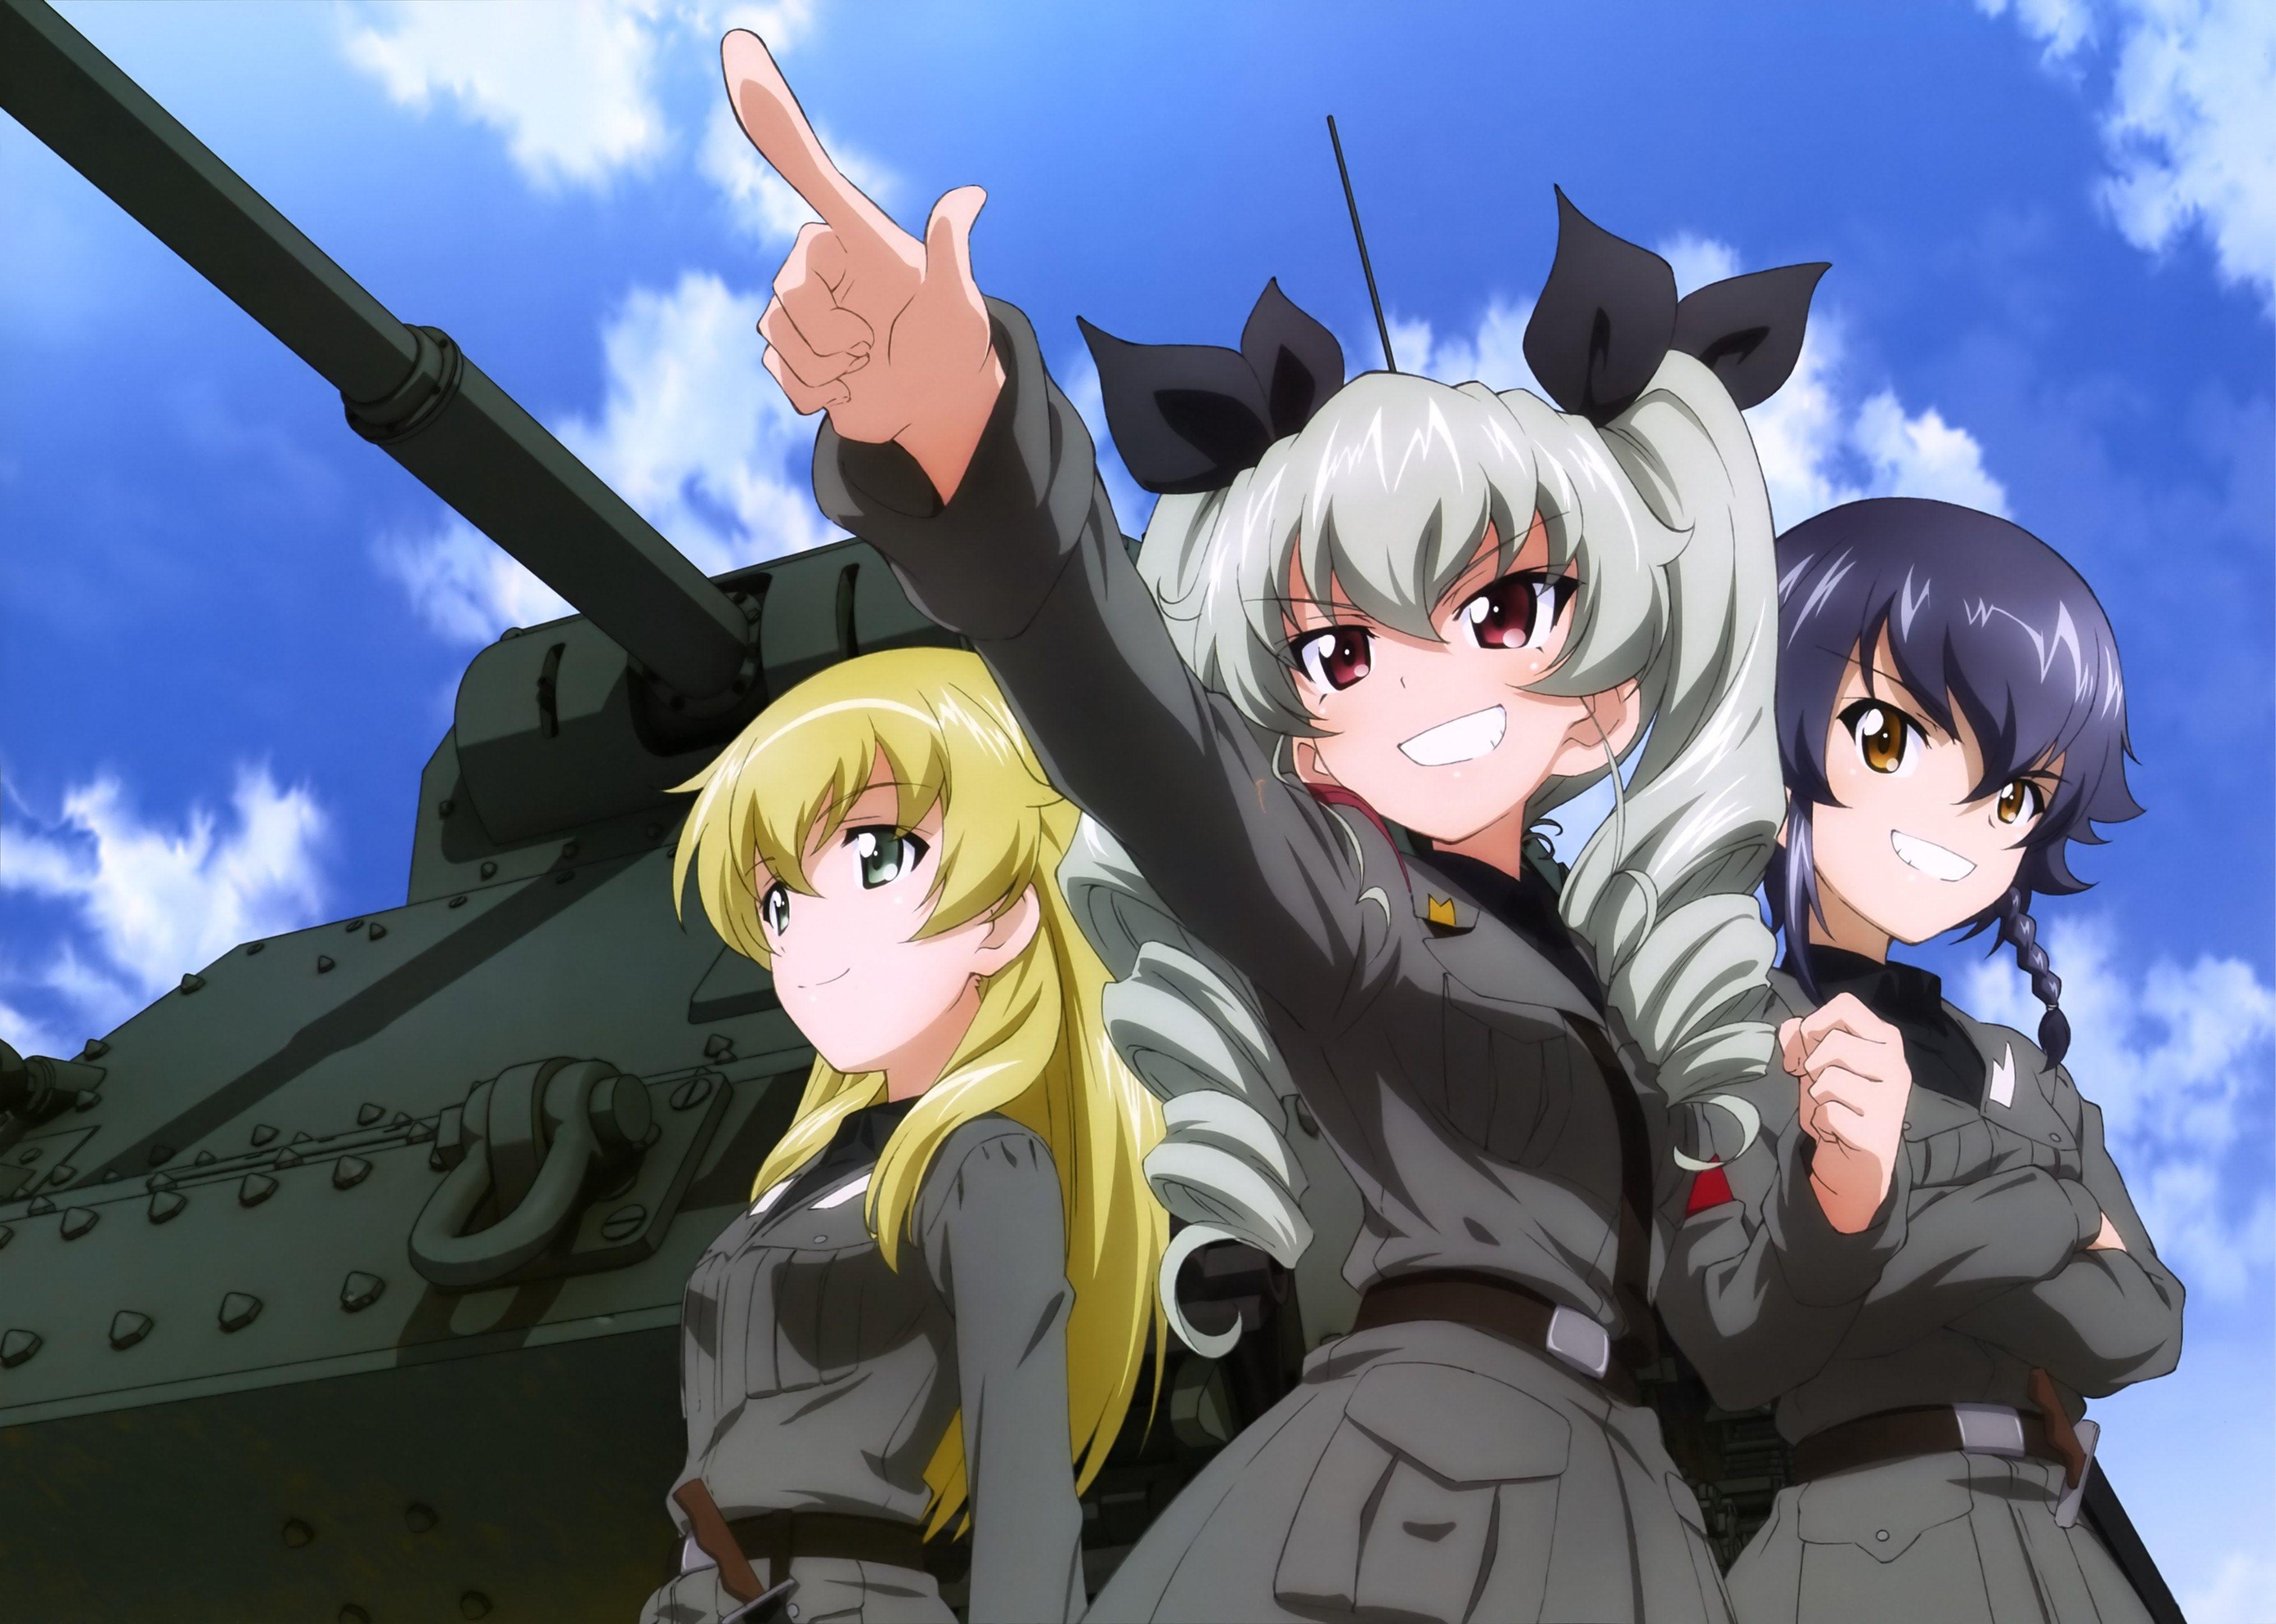 4k Girls Und Panzer Hd Wallpaper 4059x2896 キャラクター